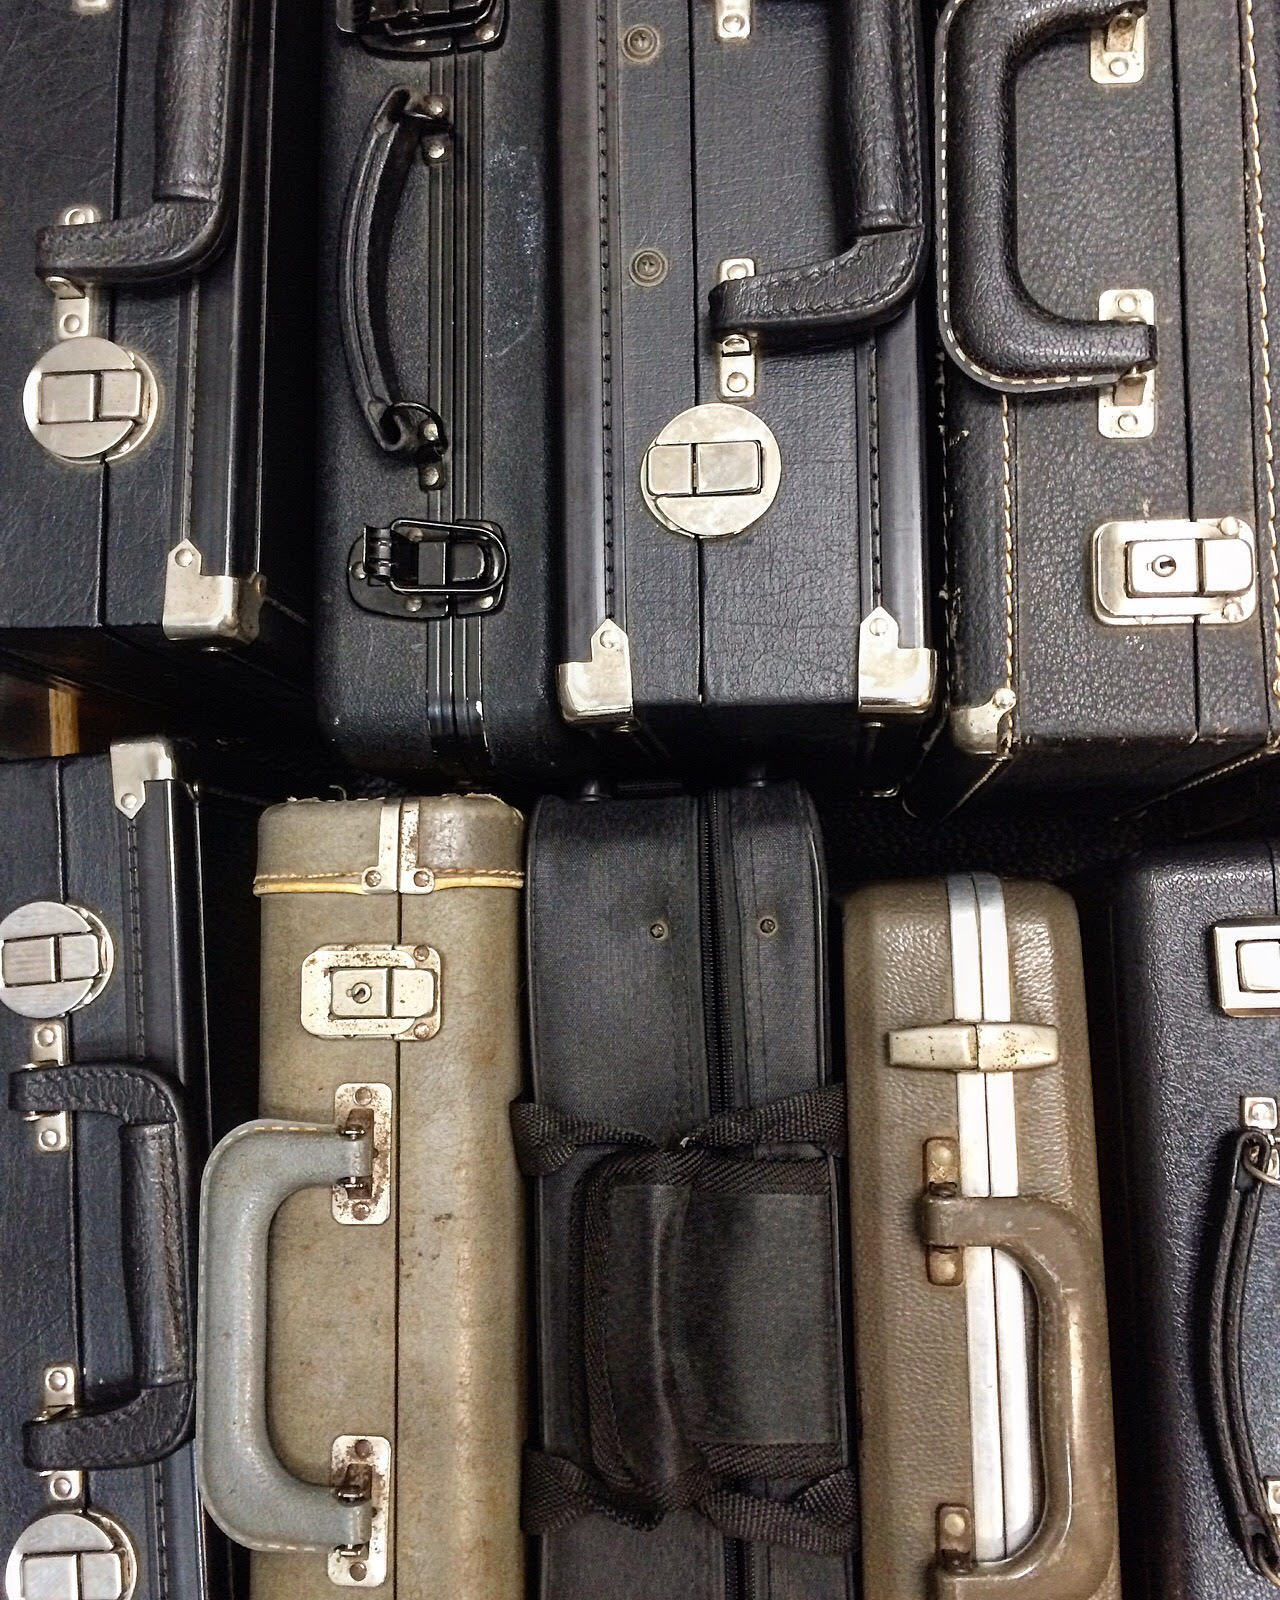 clarinet cases.jpg